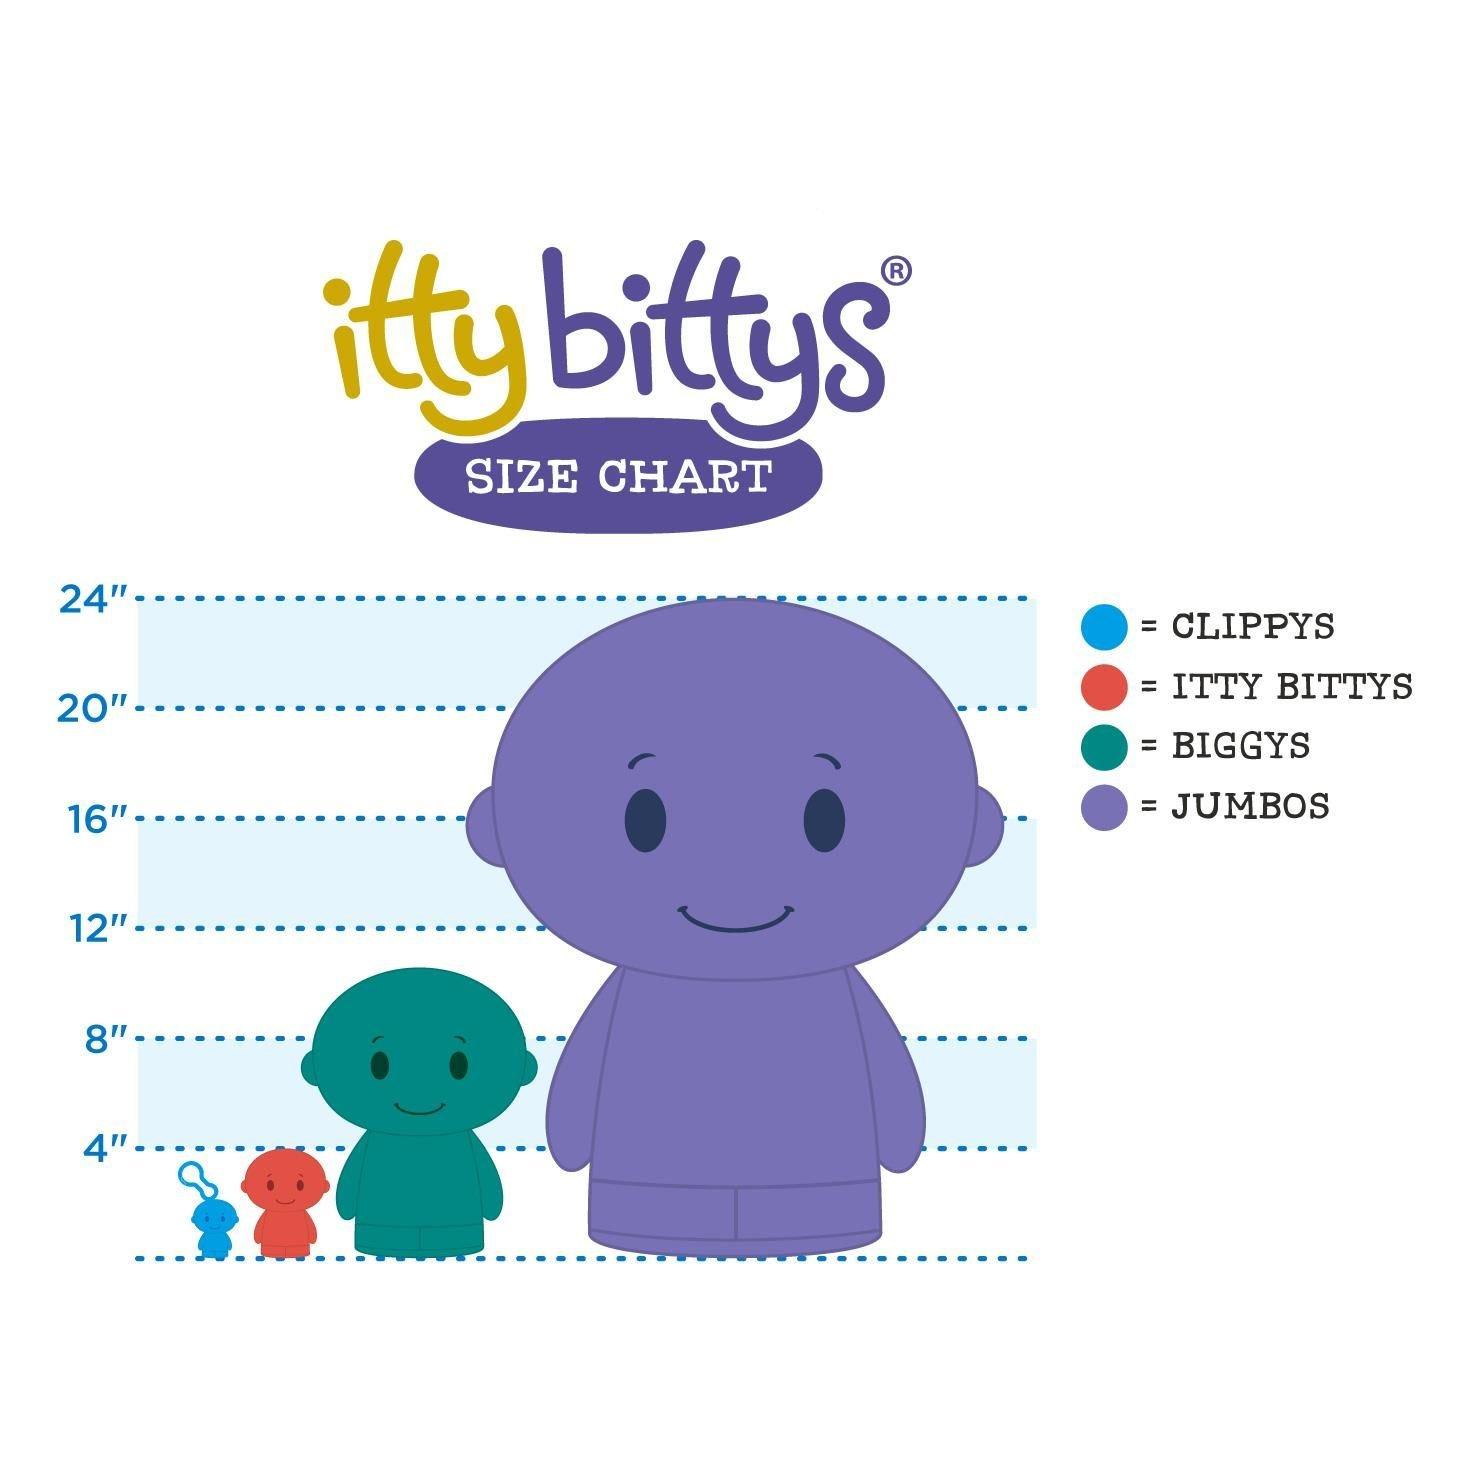 itty bittys CHEWBACCA Stuffed Animal Itty Bittys Back to School Sci-Fi Hallmark KID3294